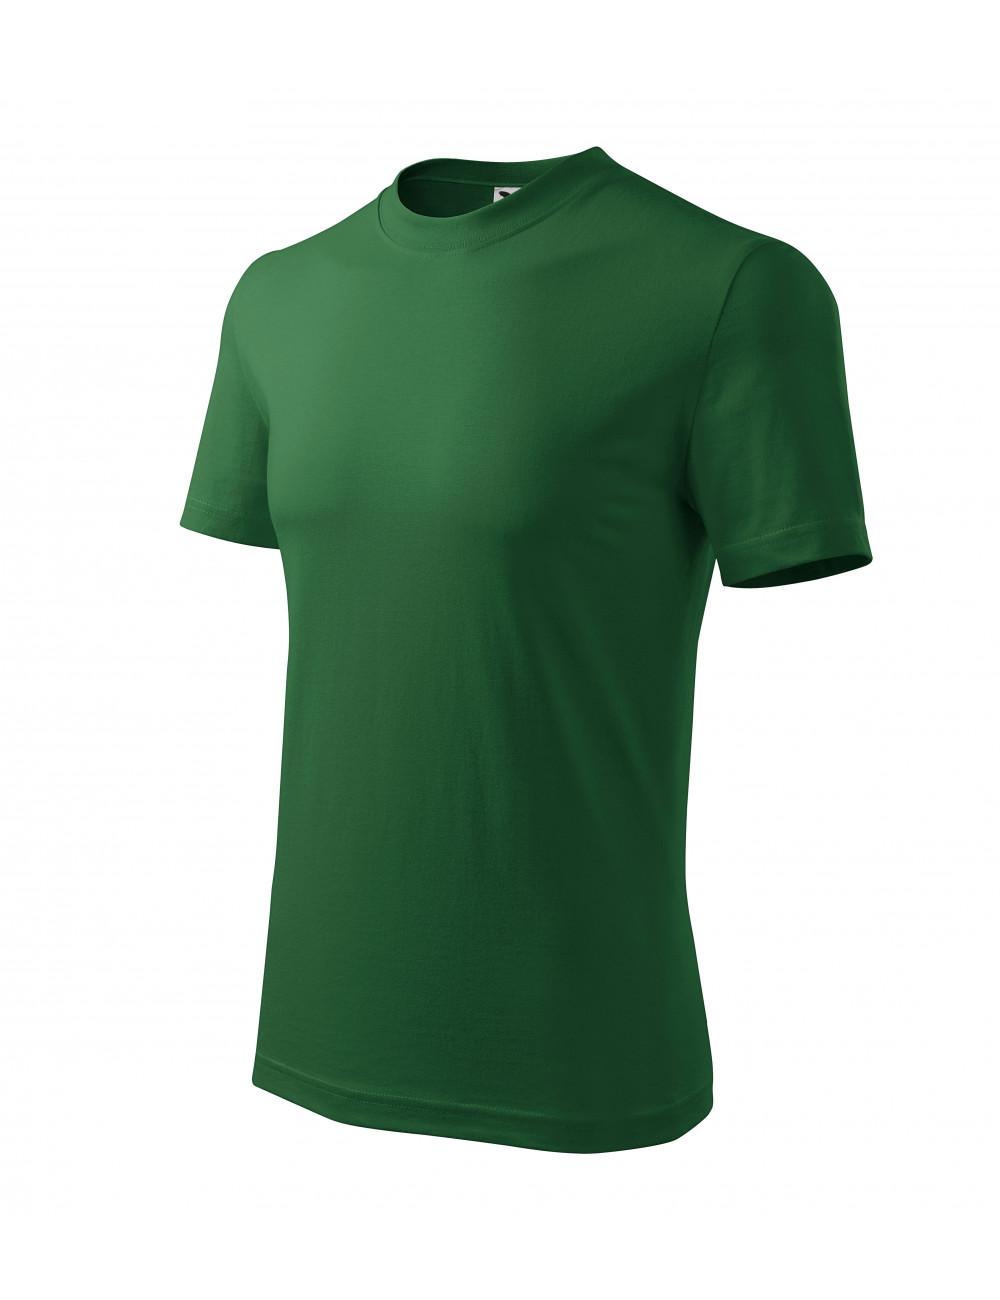 Adler MALFINI Koszulka unisex Classic 101 zieleń butelkowa